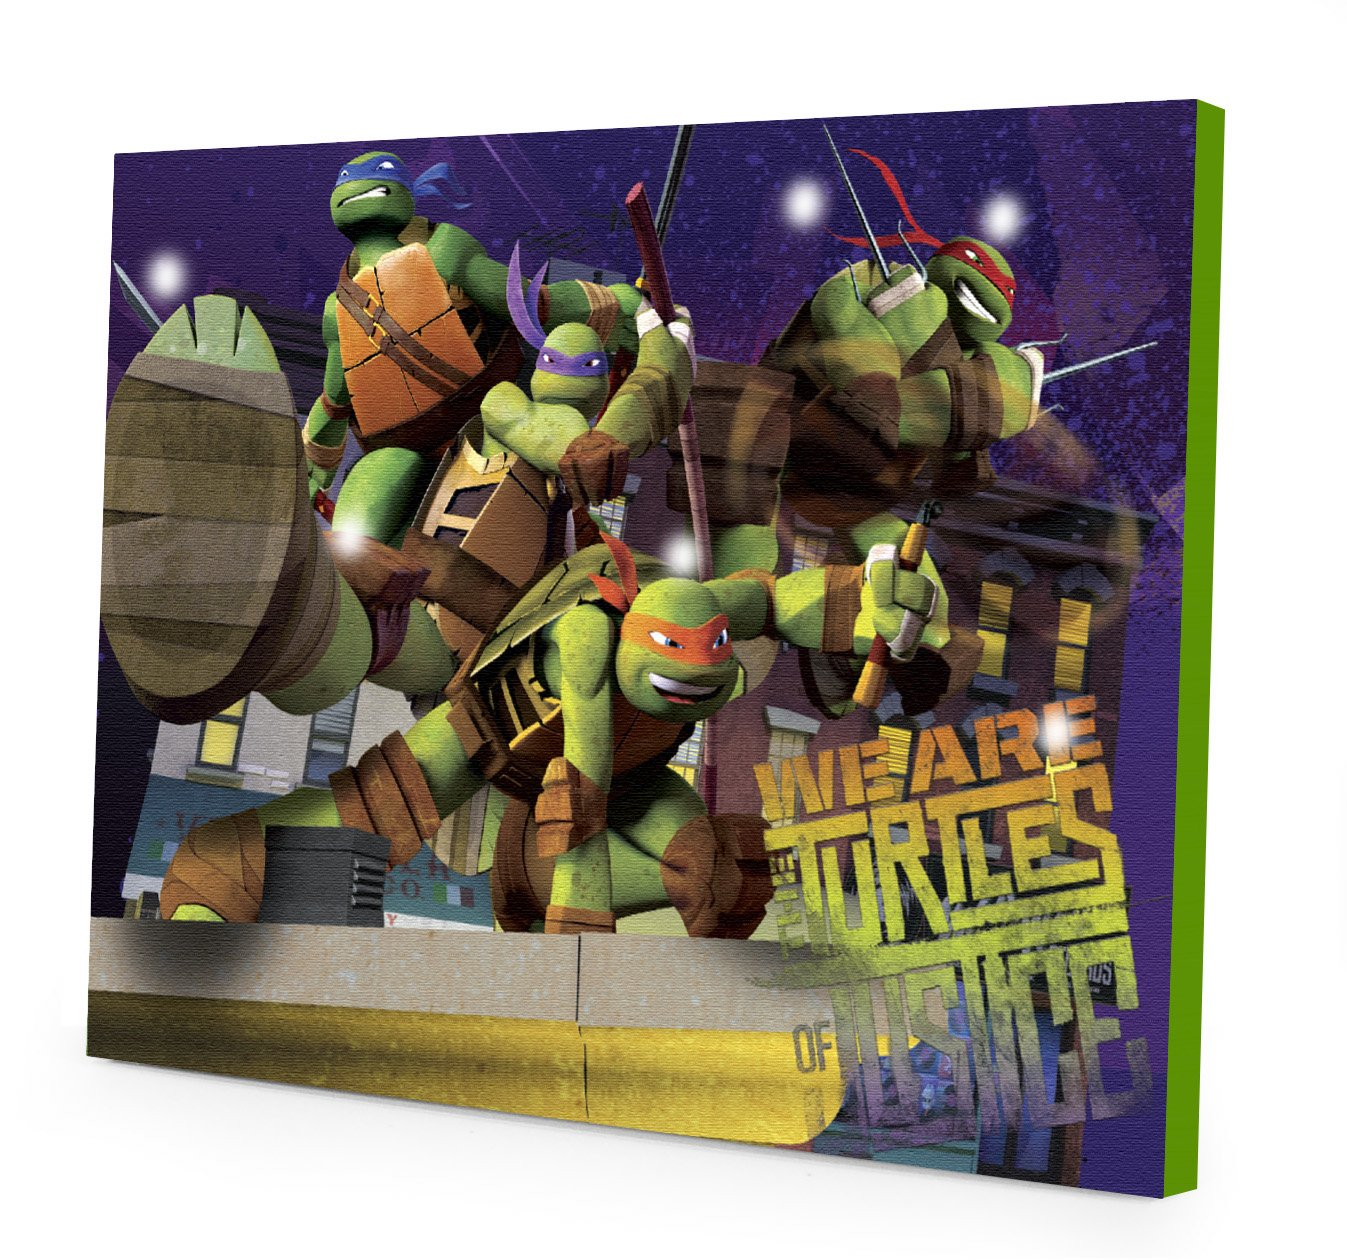 Amazon.com: Nickelodeon Teenage Mutant Ninja Turtles LED Canvas Wall Art,  15.75-Inch x 11.5-Inch: Toys & Games - Amazon.com: Nickelodeon Teenage Mutant Ninja Turtles LED Canvas